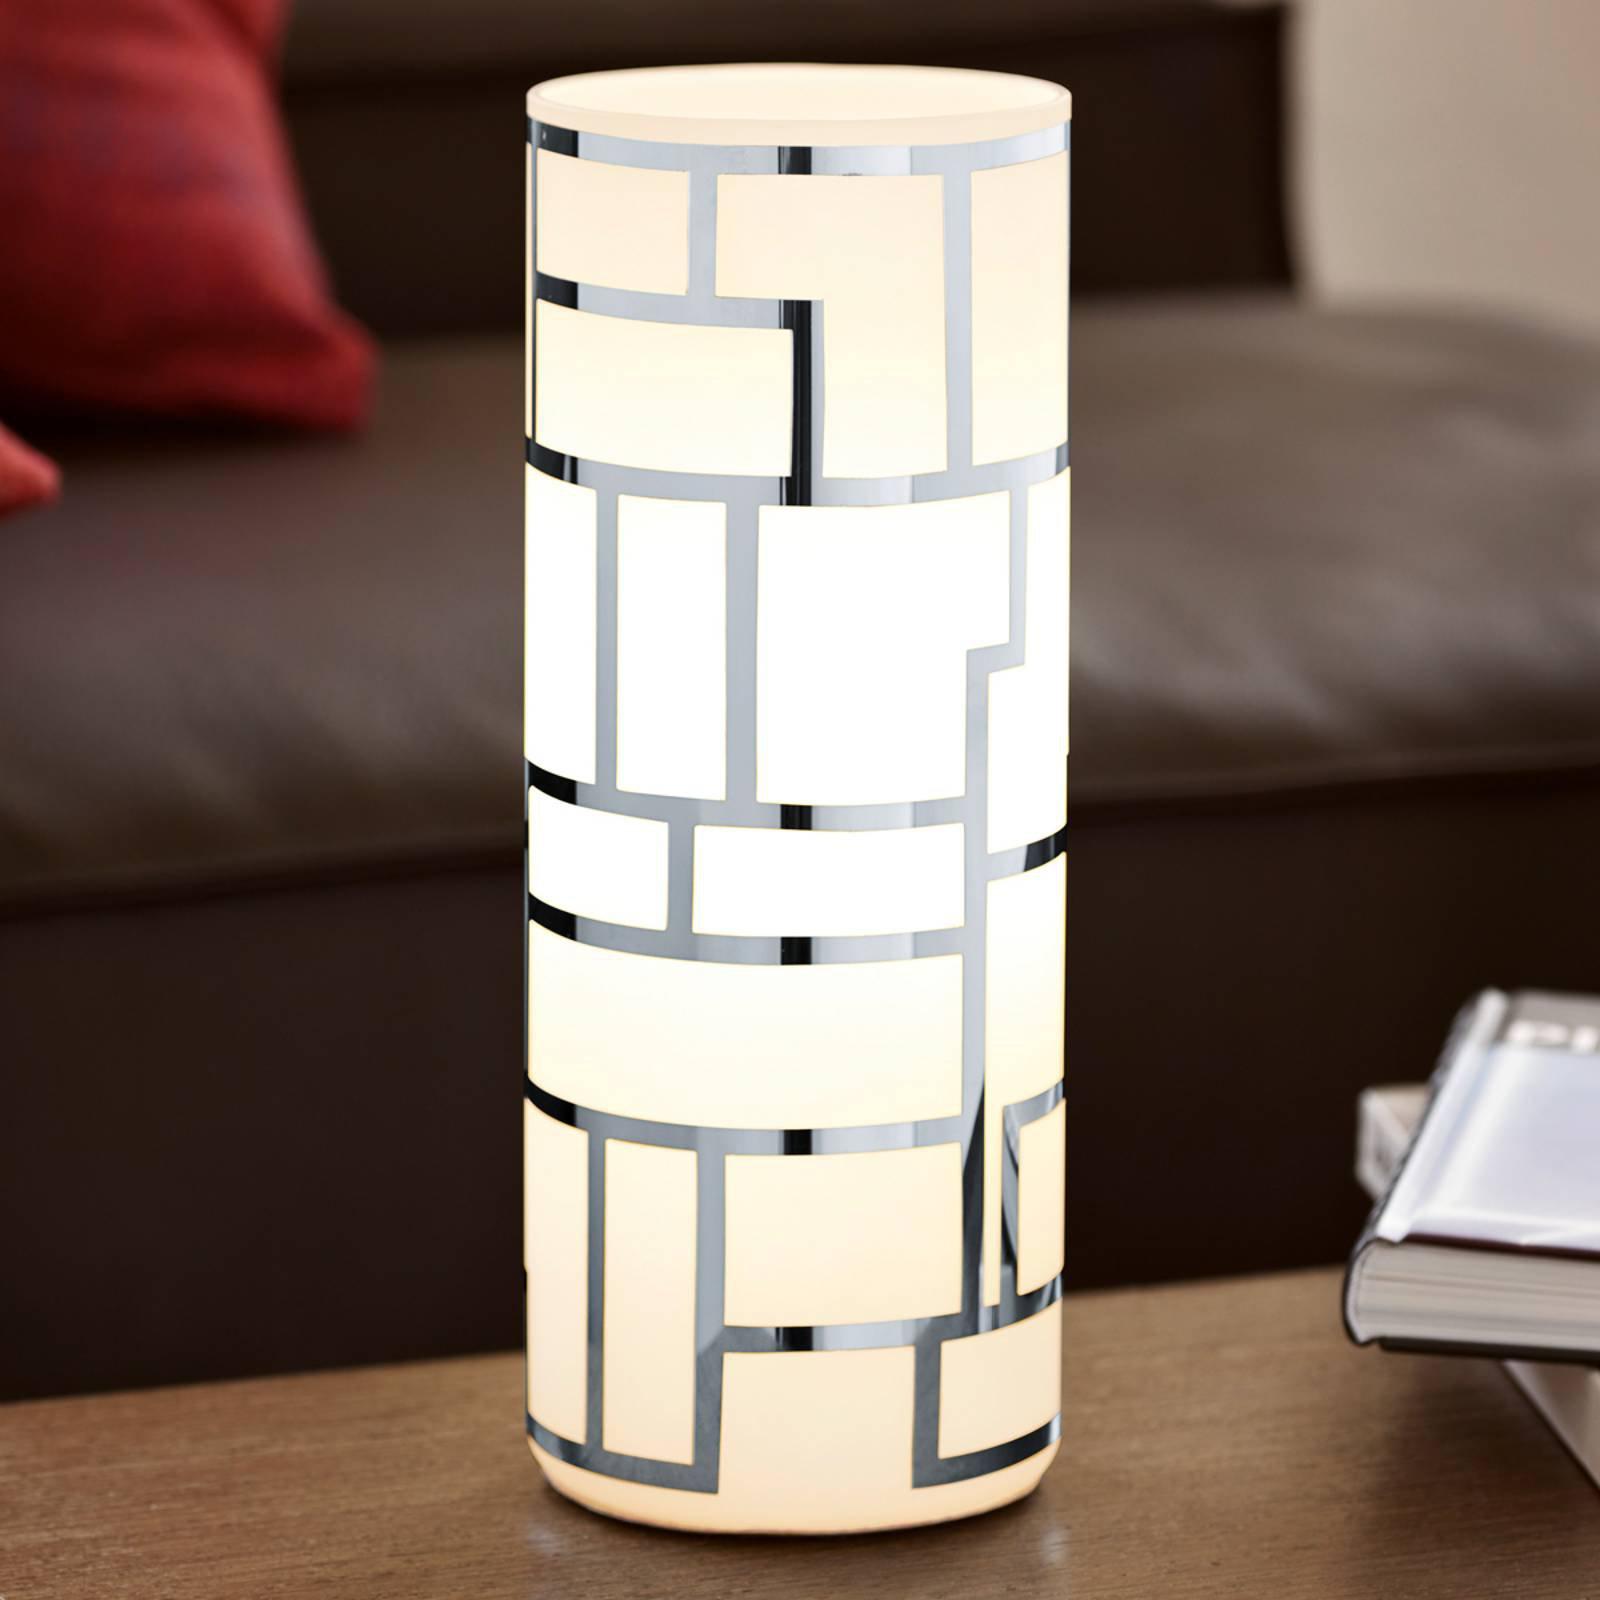 Sylinderbordlampe Bayman